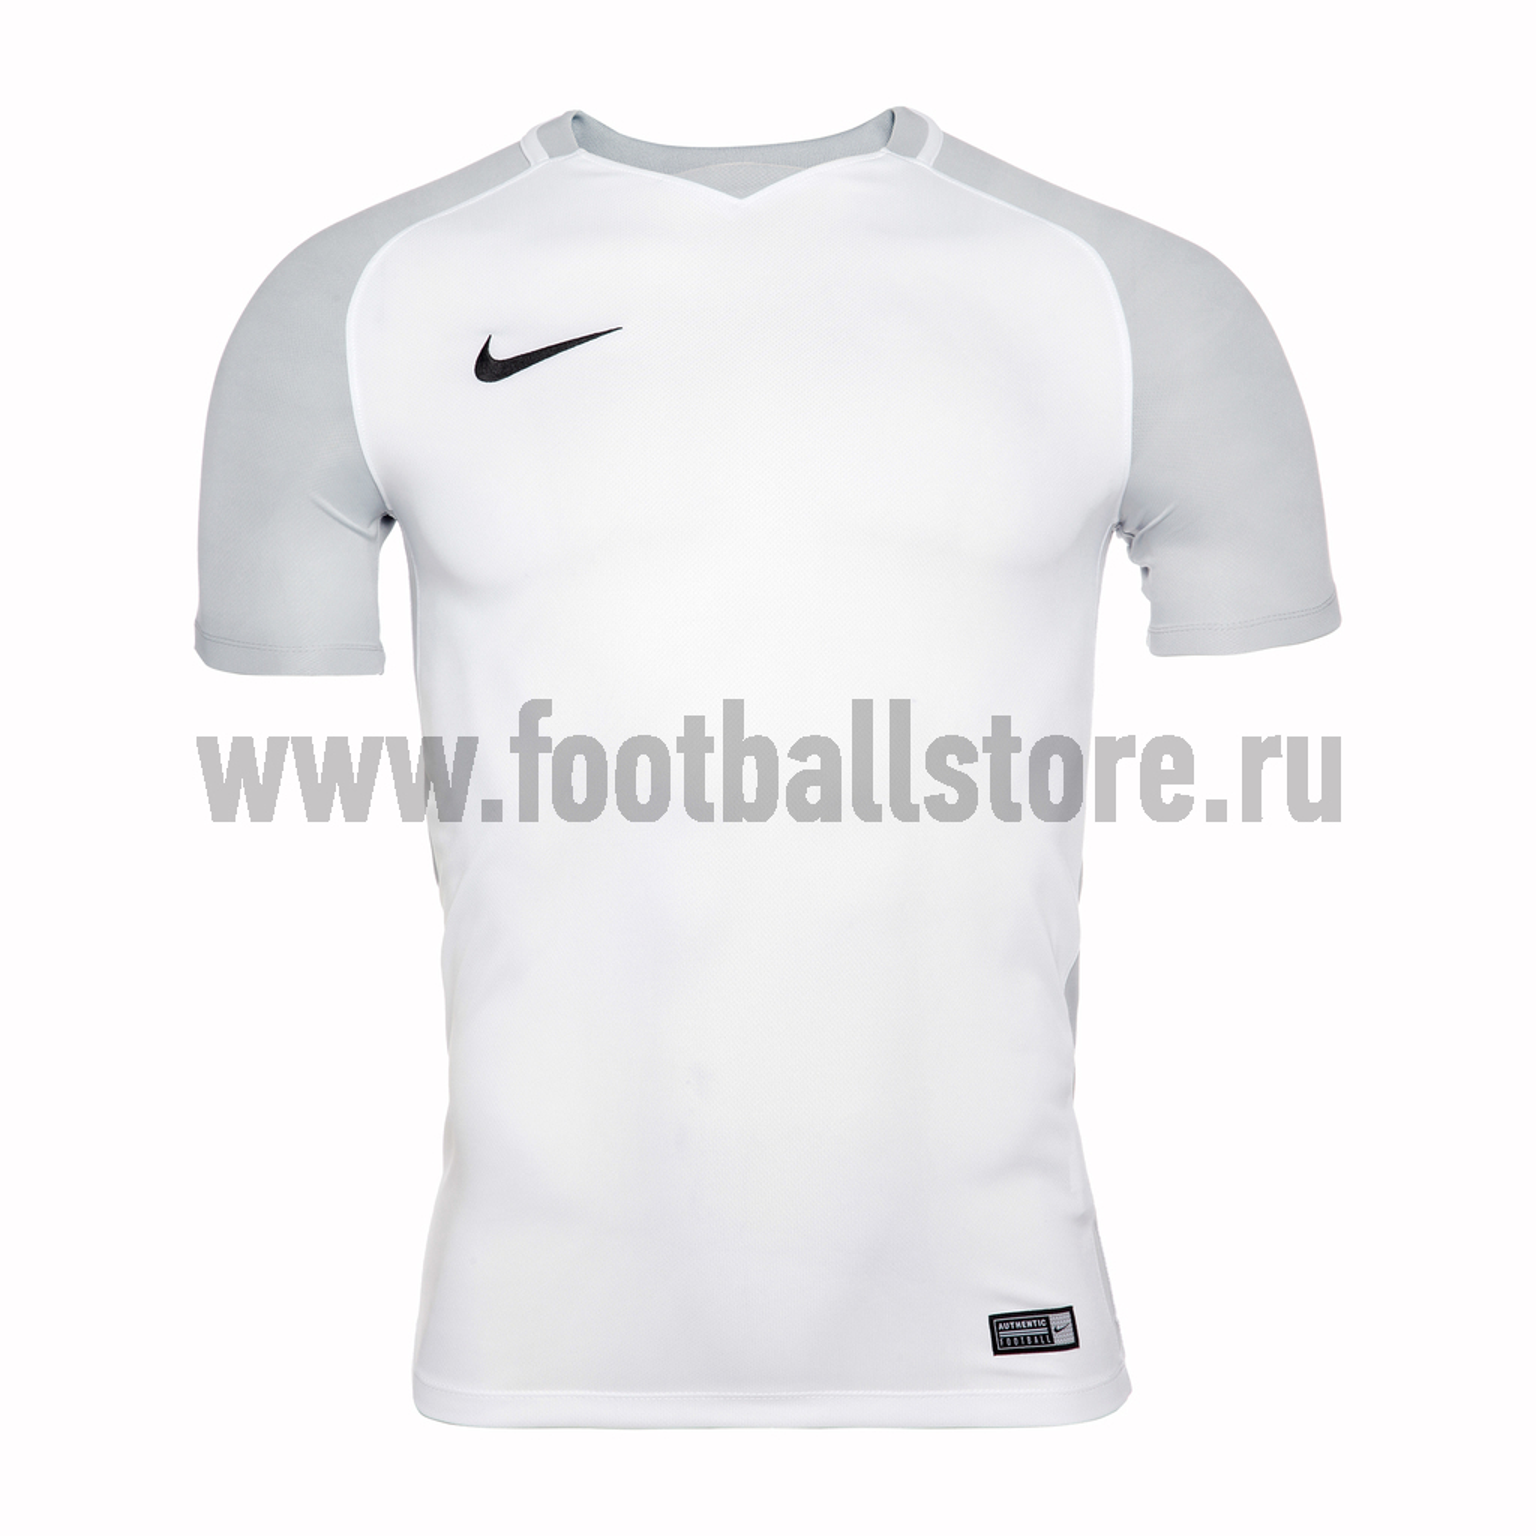 Футболки Nike Футболка игровая Nike Trophy III 881483-100 игровая форма nike футболка детская nike ss precision iii jsy boys 645918 410